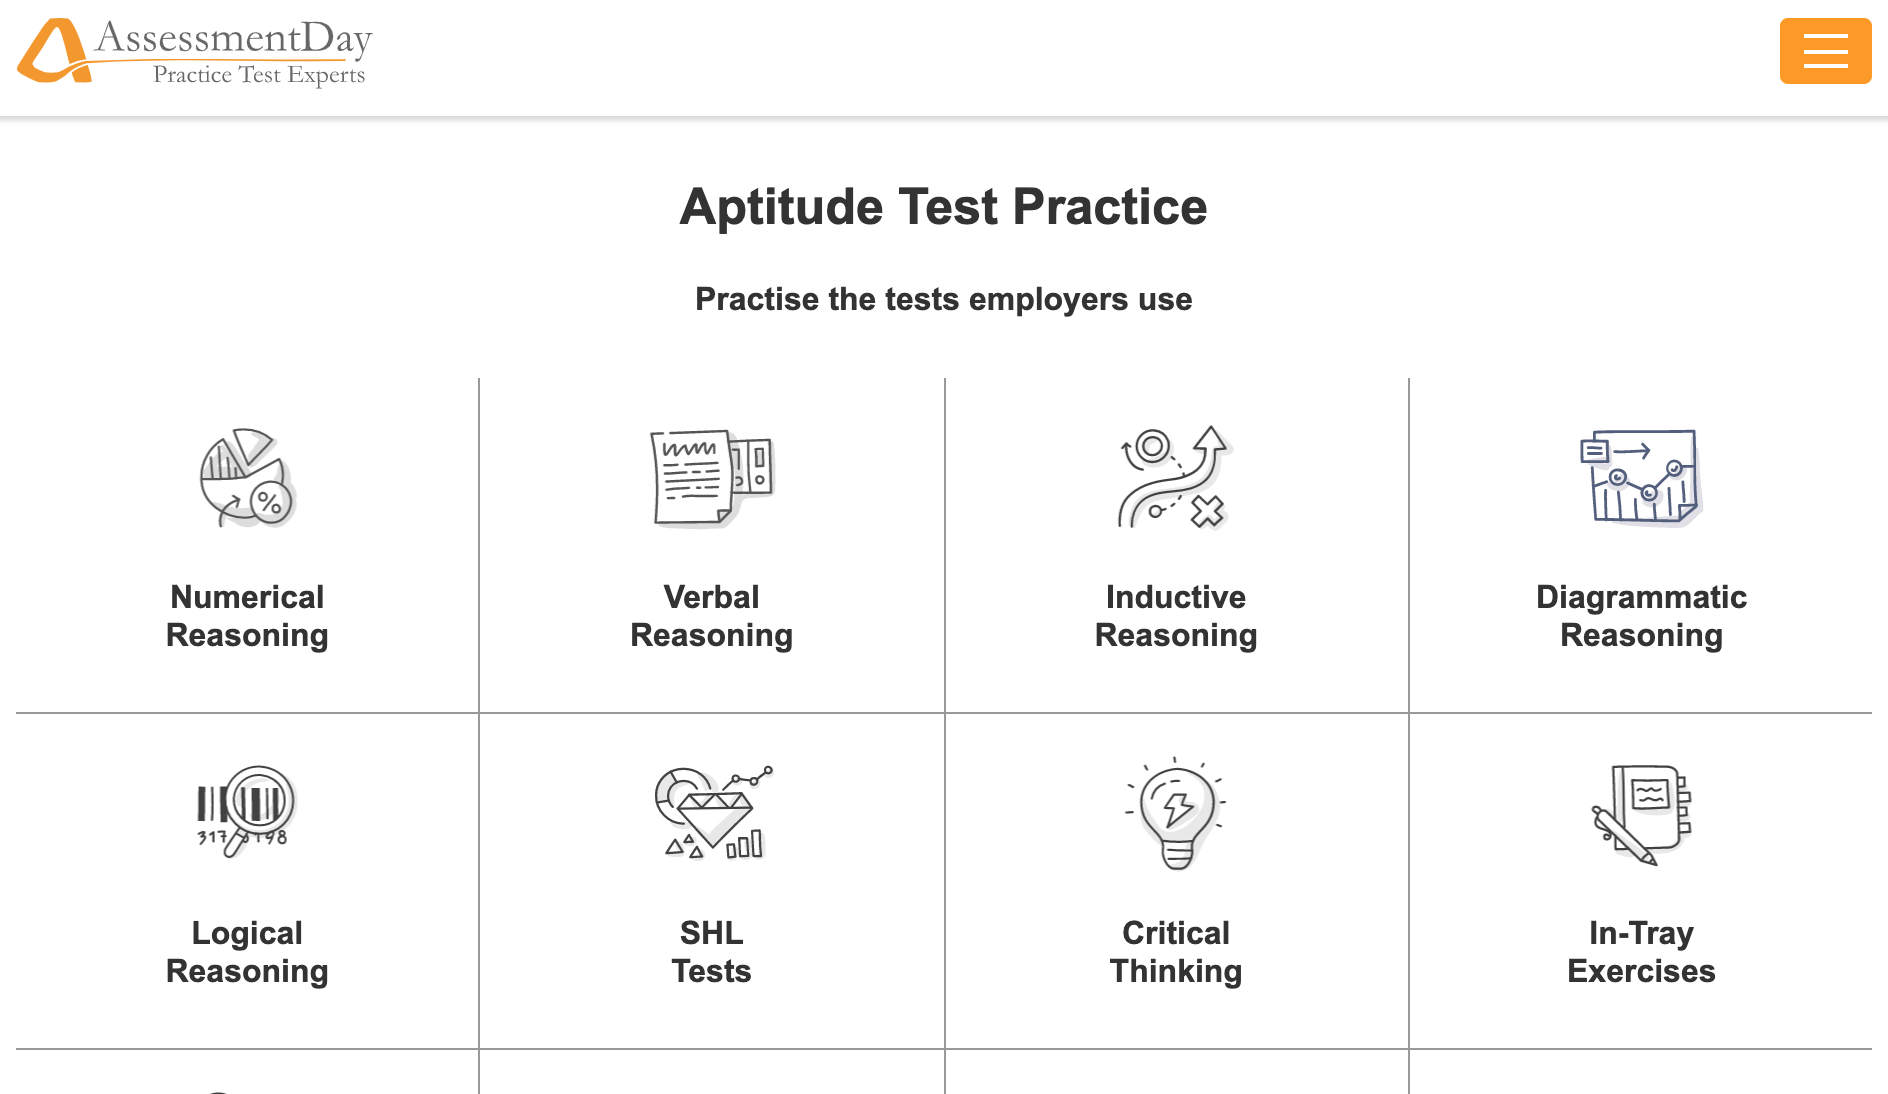 psychometric tests website uk